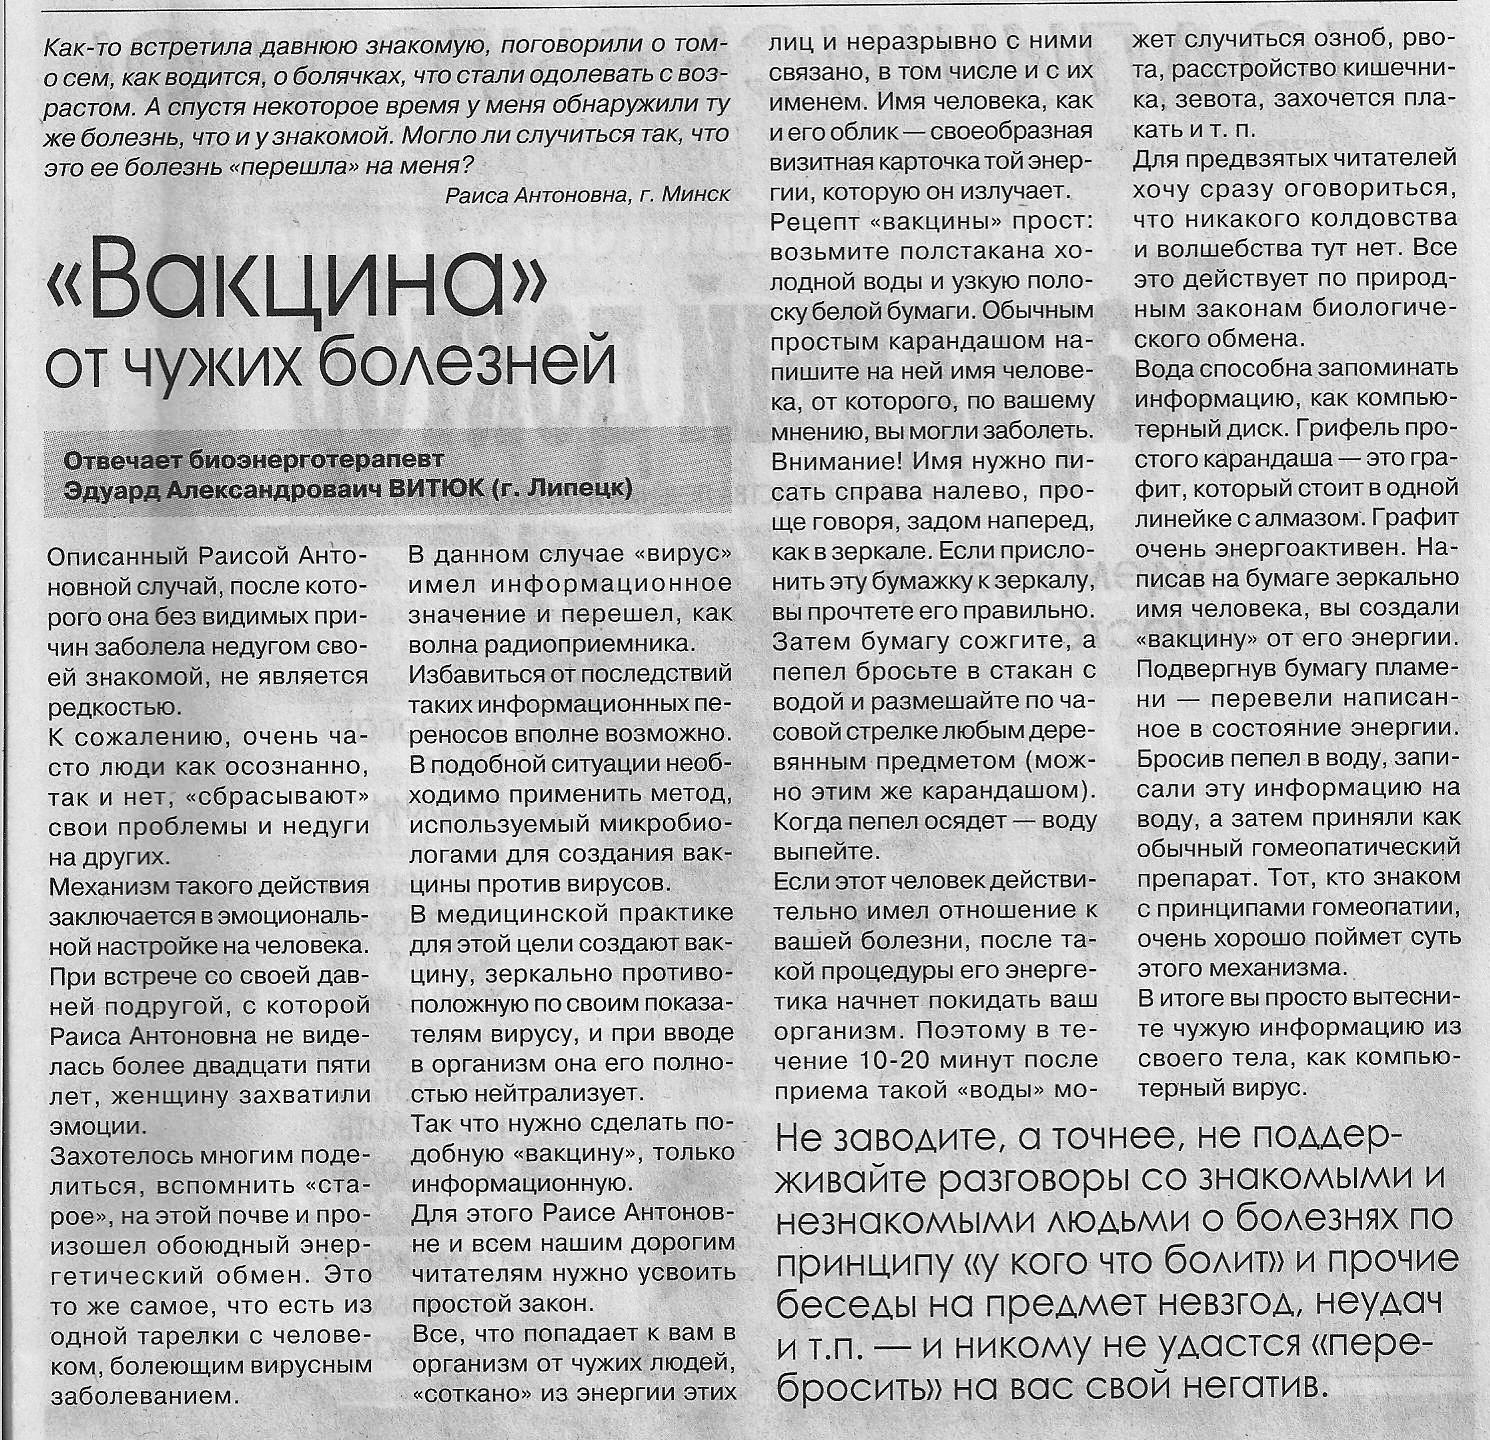 http://s3.uploads.ru/6iyS9.jpg